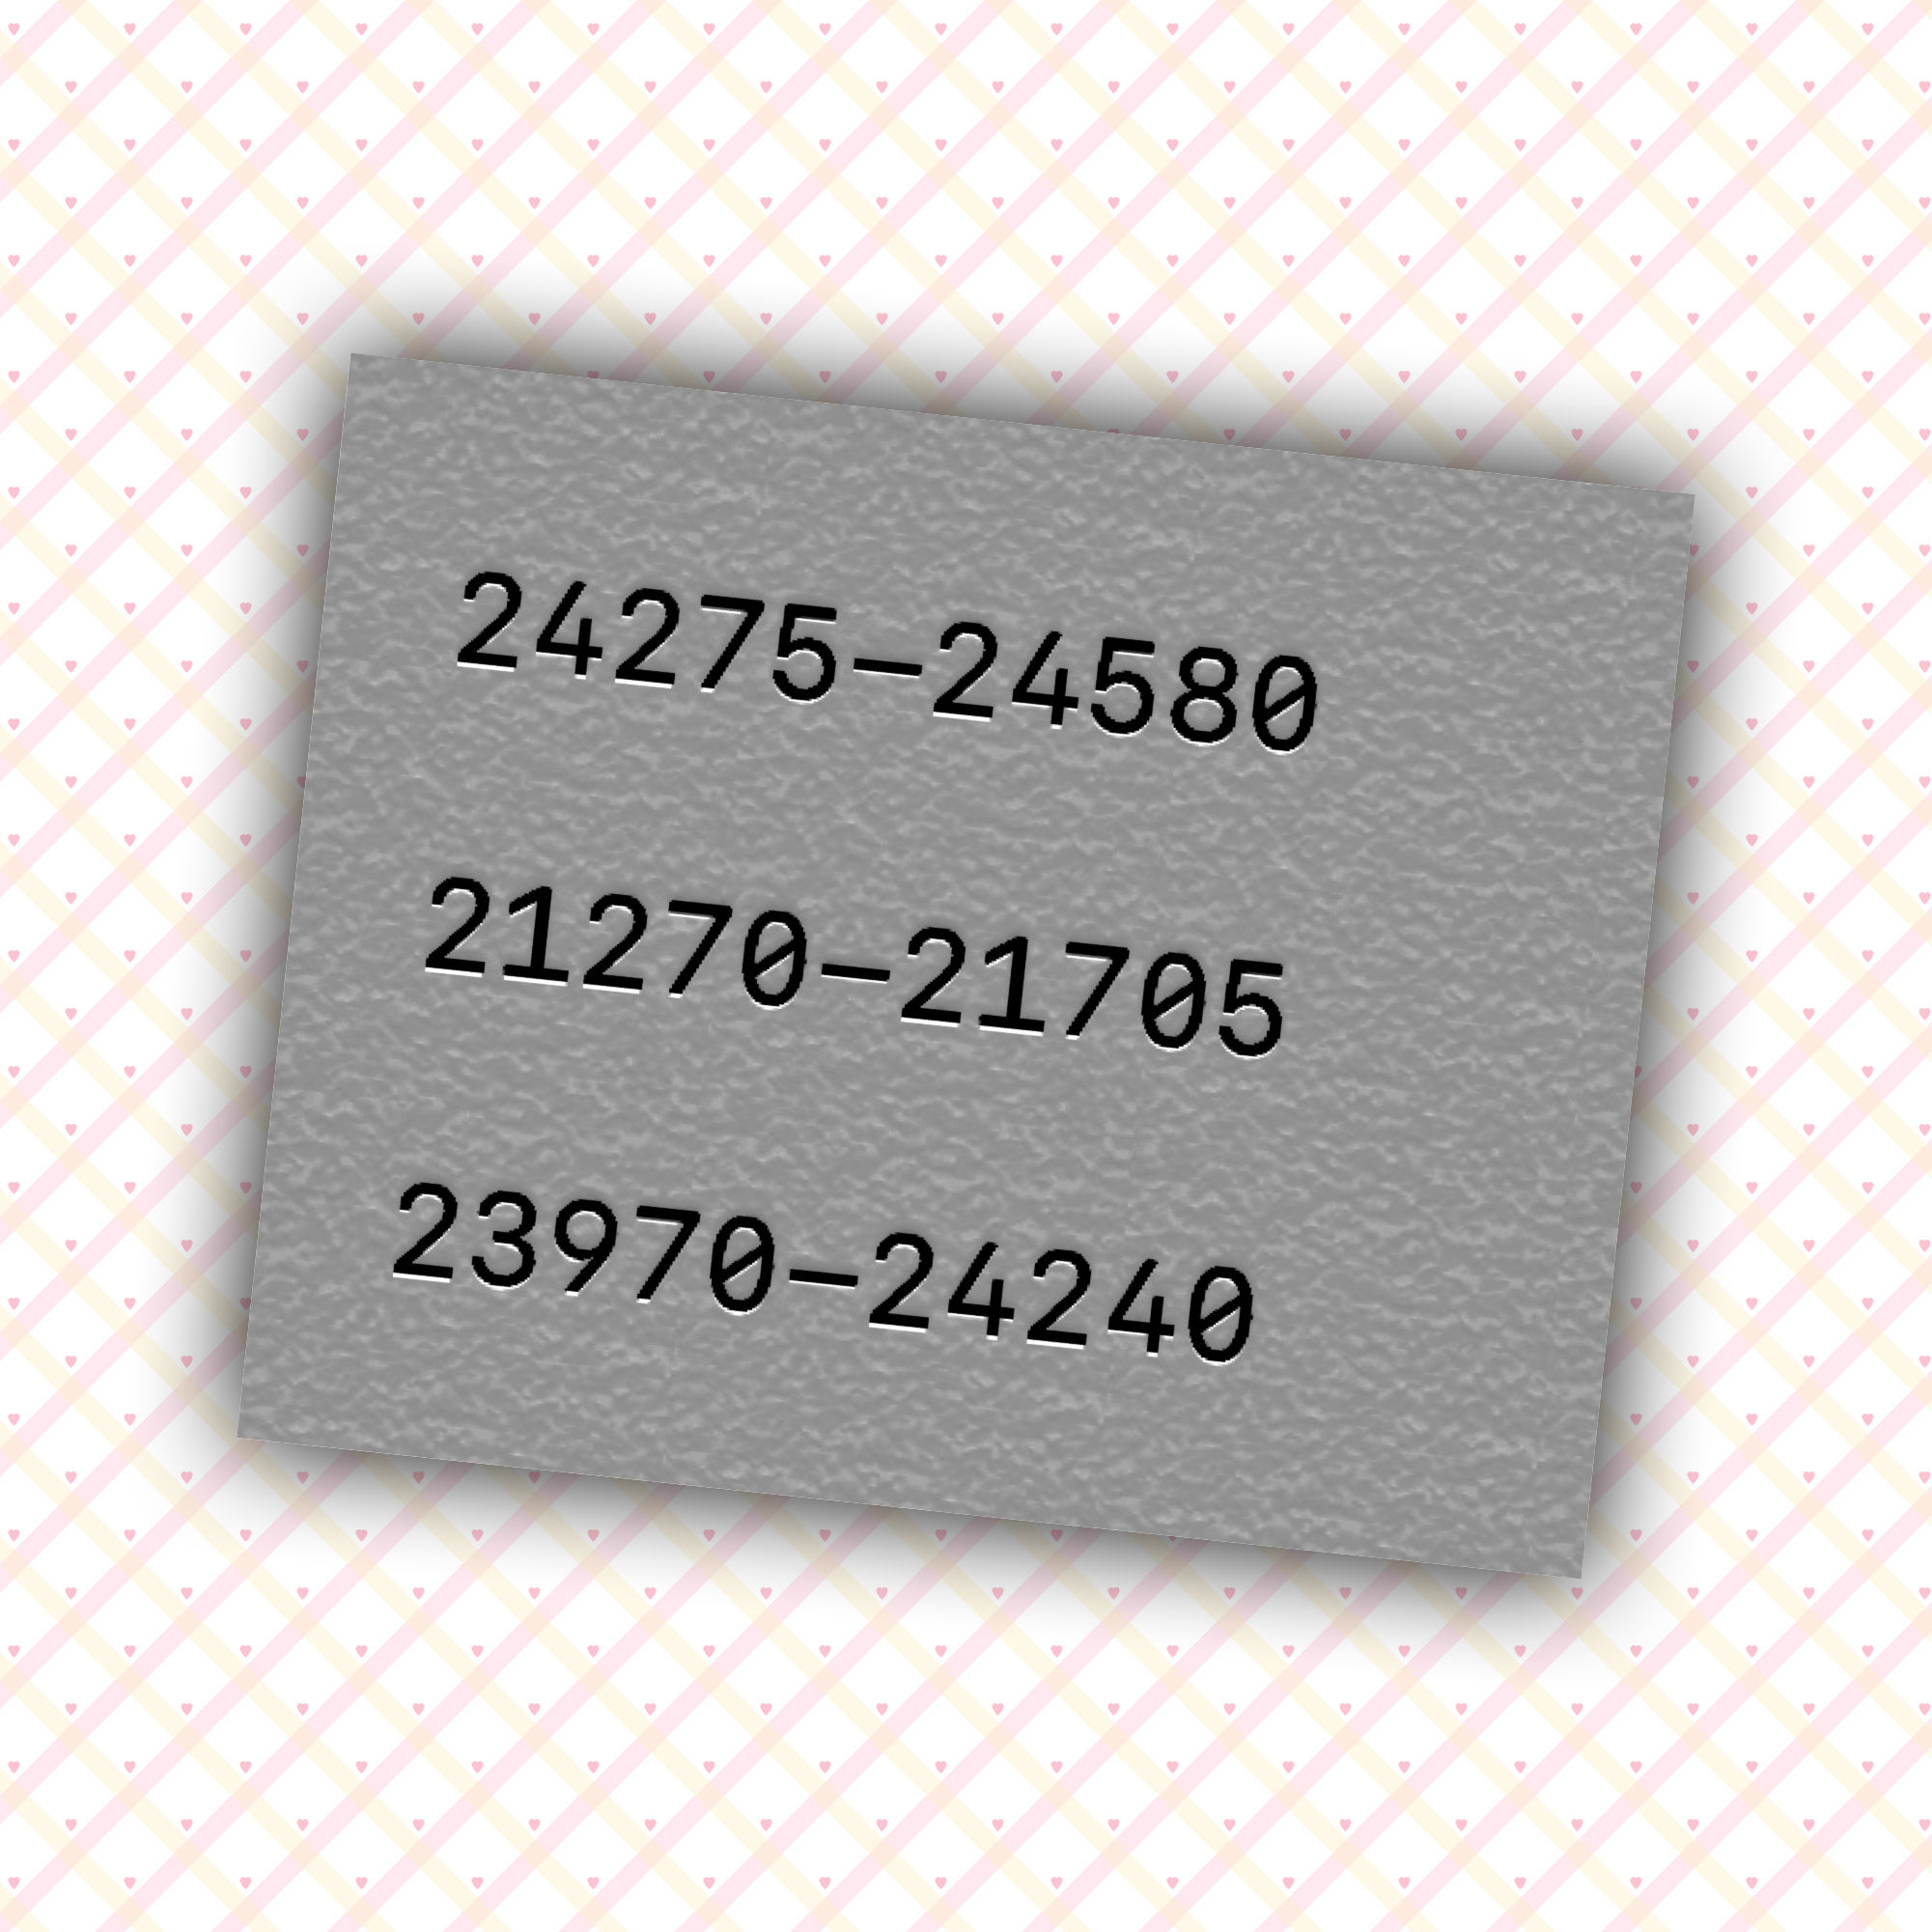 AF114F9B-891F-4546-B038-67519D3588D7.jpeg